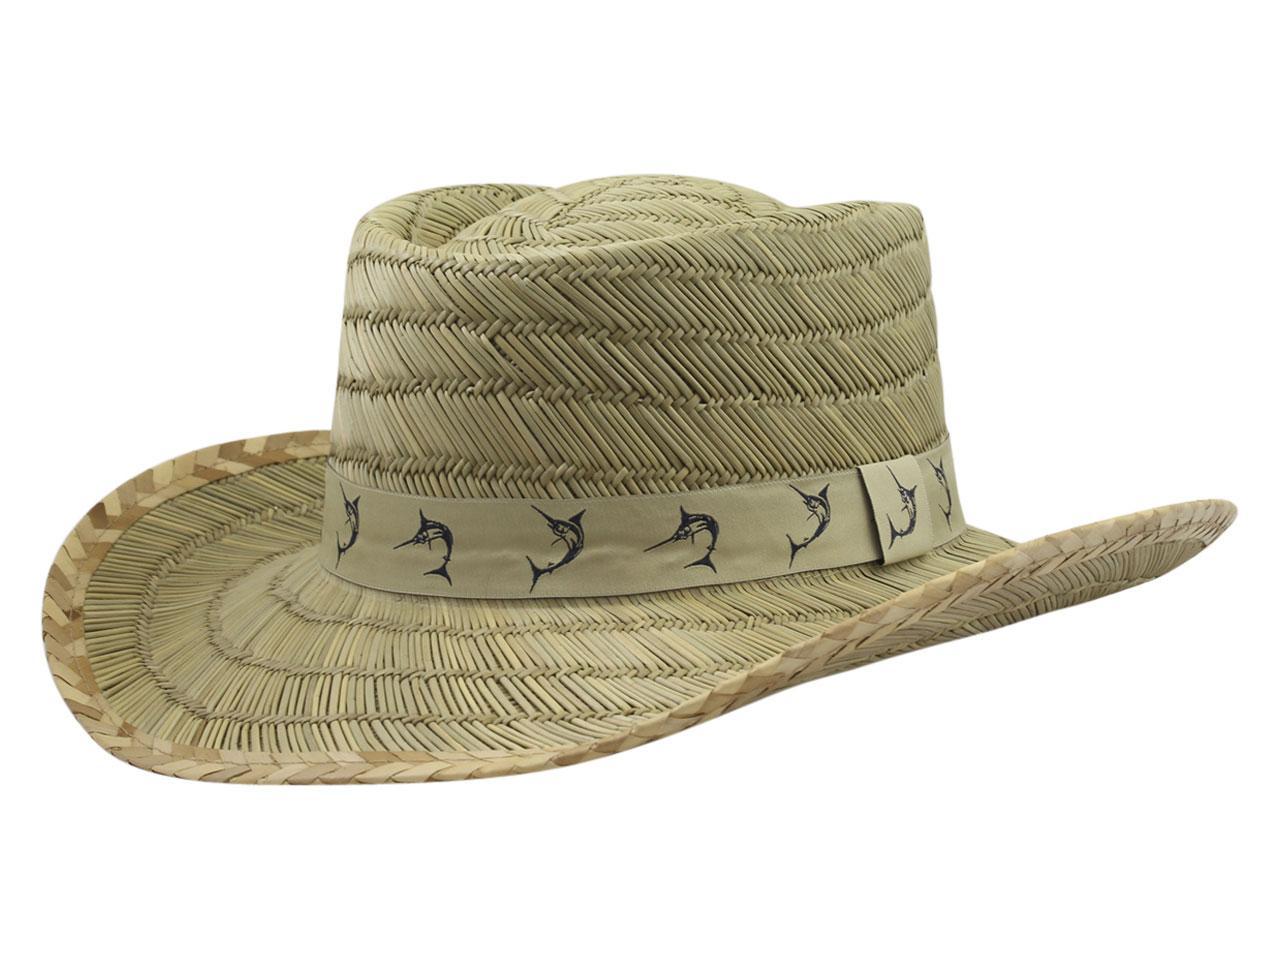 85d235cb631 Dorfman Pacific Men's Marlin Tape Rush Gambler Hat